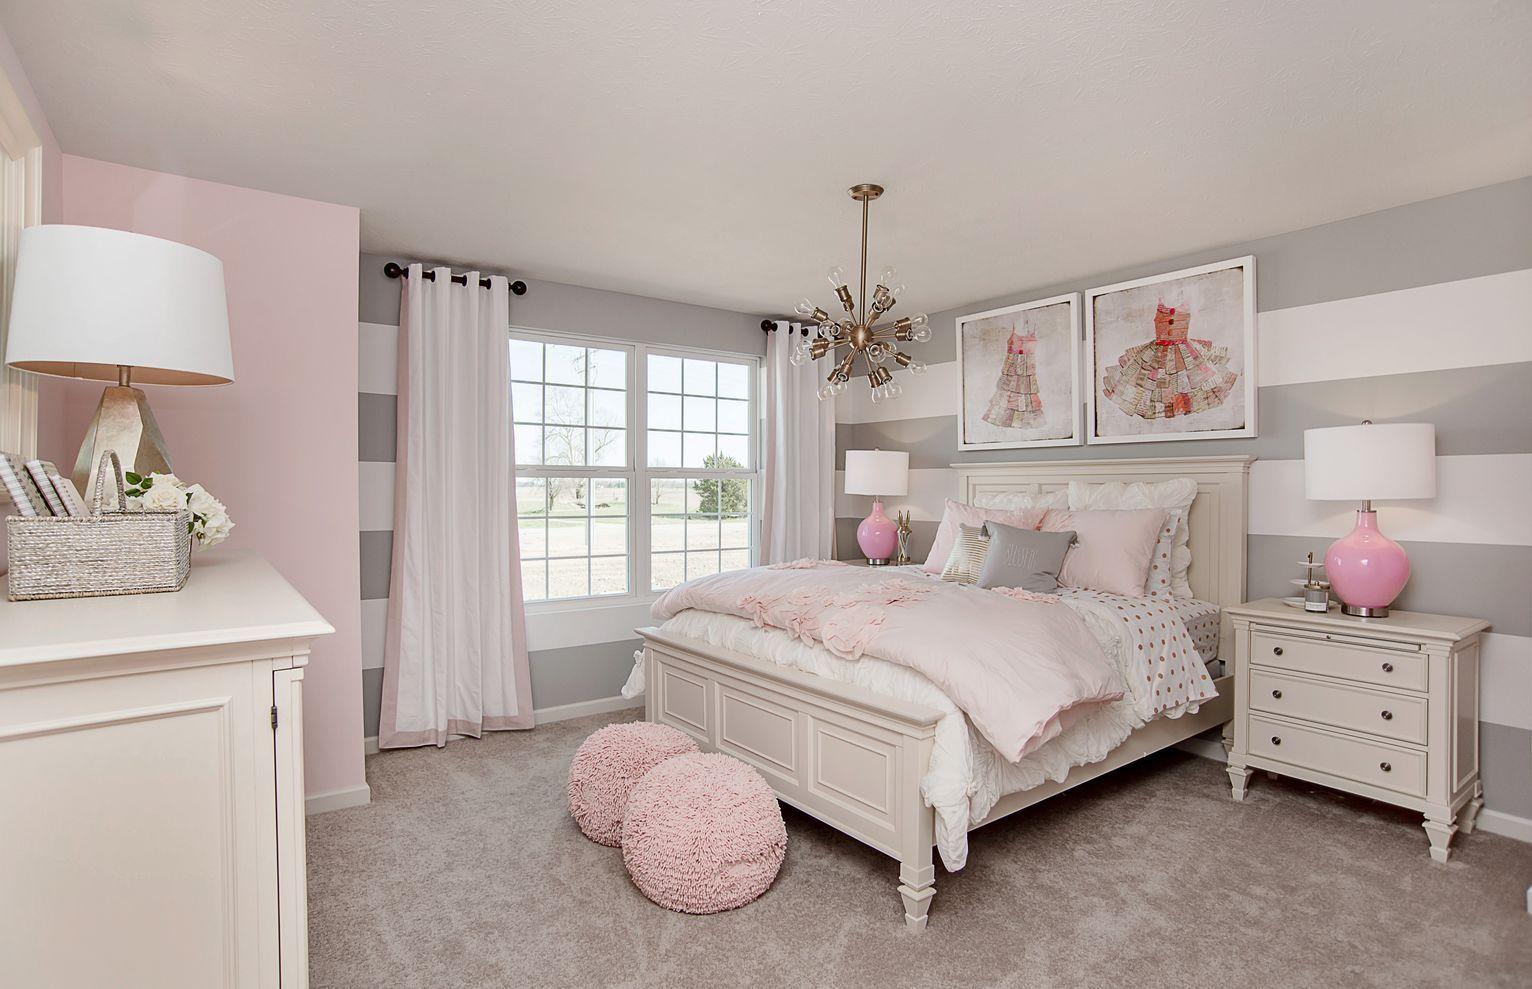 cute apartment bedroom decorating ideas. 69 Cute Apartment Bedroom Ideas You Will Love - Round Decor Decorating E